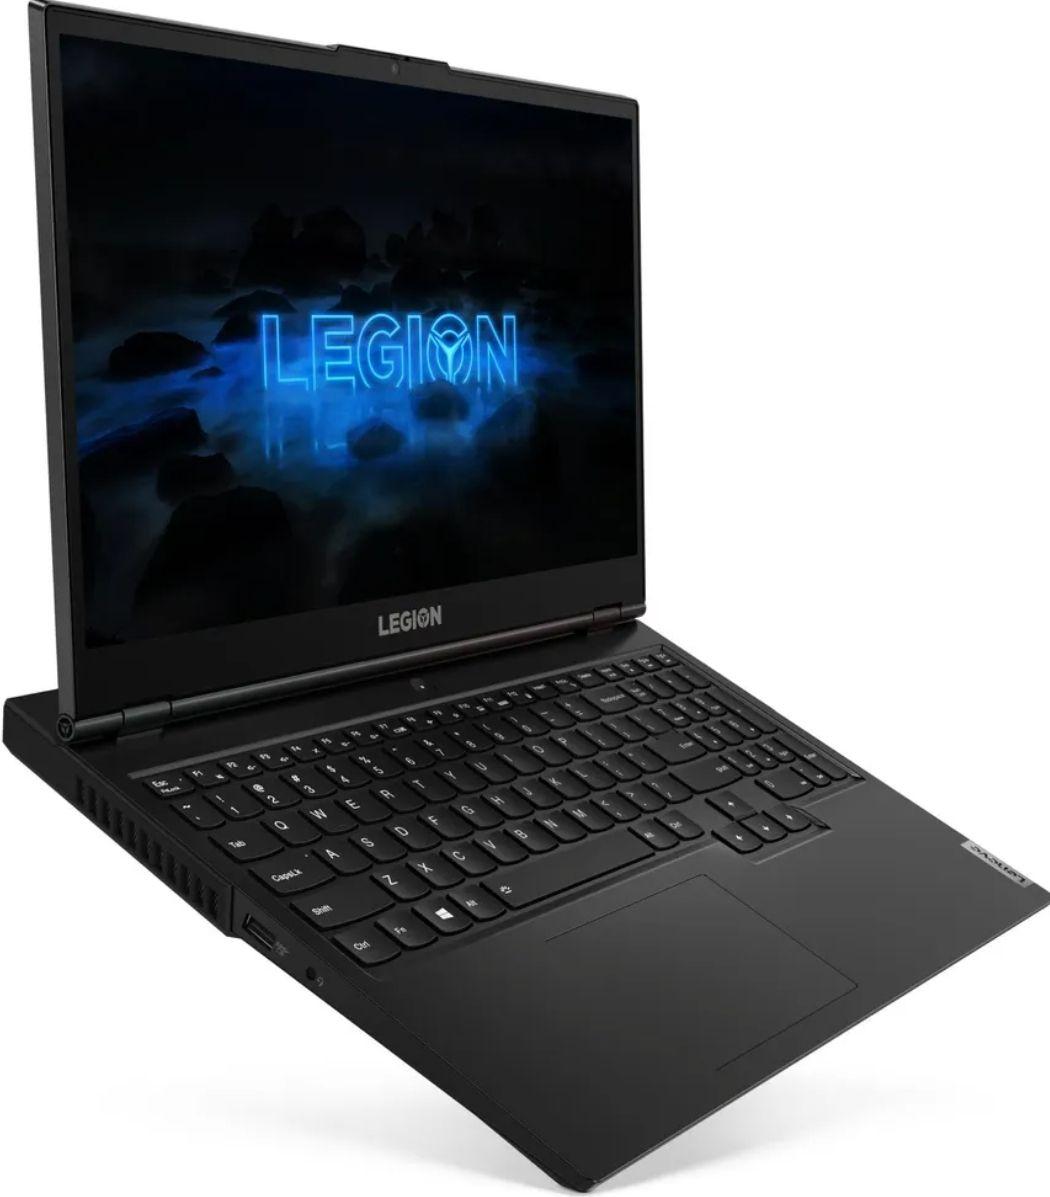 Laptop Lenovo Legion 5 Ryzen 7 4800H, RTX2060, 8GB 3200MHz, 512 SSD, WIN10, 15,6'' 120Hz Neonet Cashback Goodie